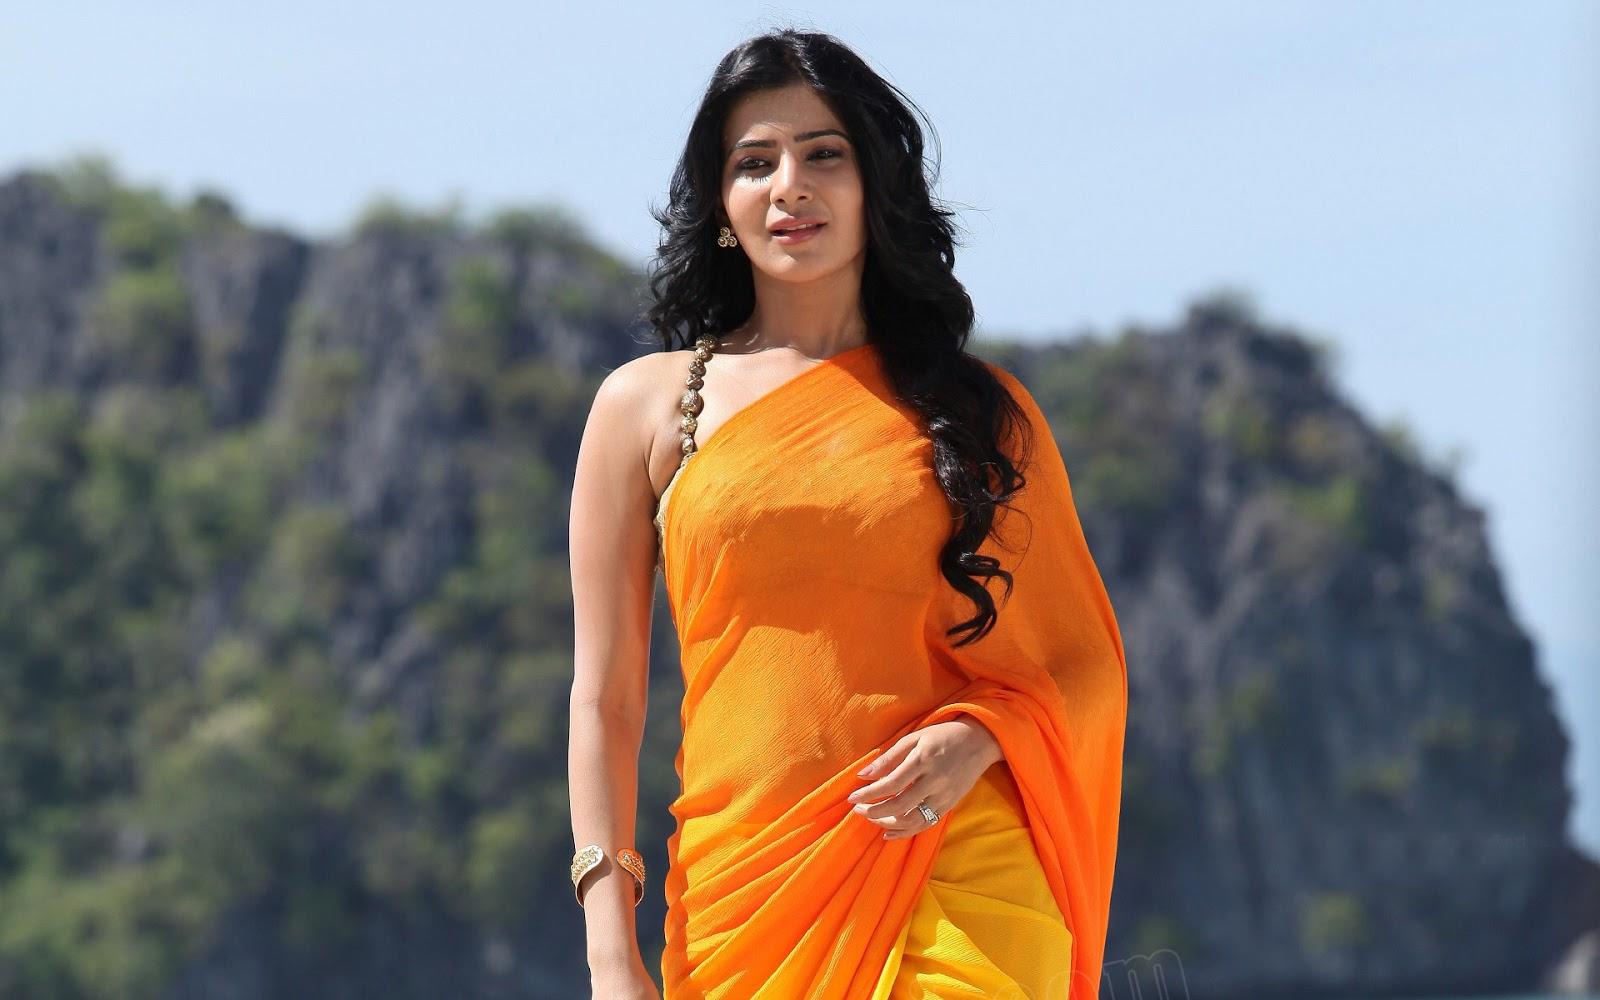 Bollywood actress images and hd wallpapers samantha ruth - South indian actress wallpaper ...